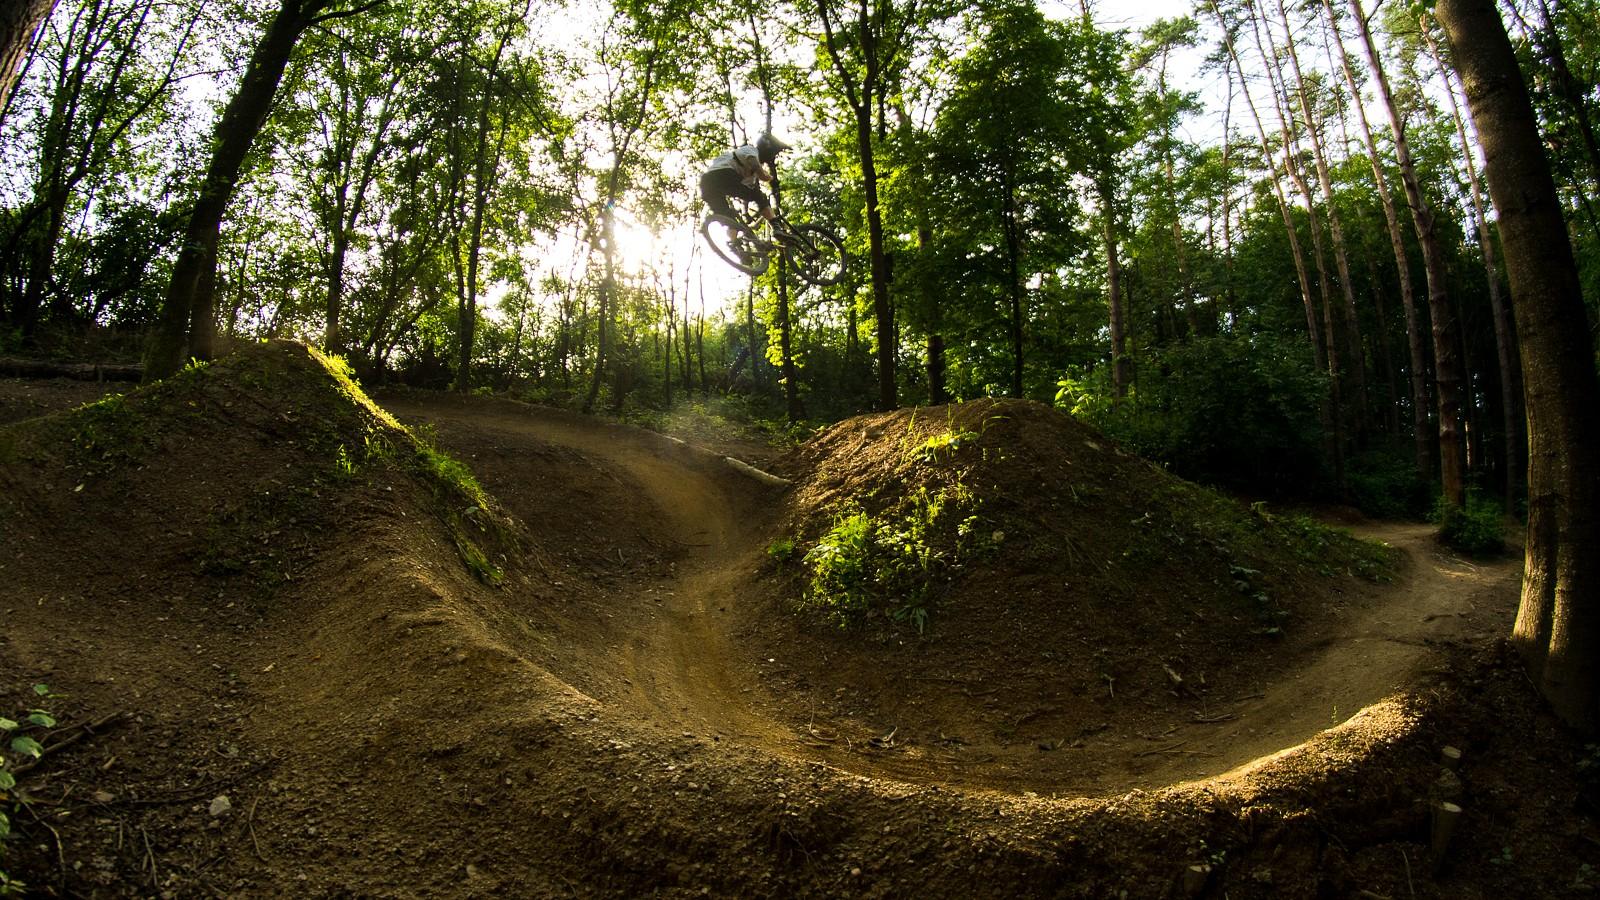 over the trail - Banan - Mountain Biking Pictures - Vital MTB